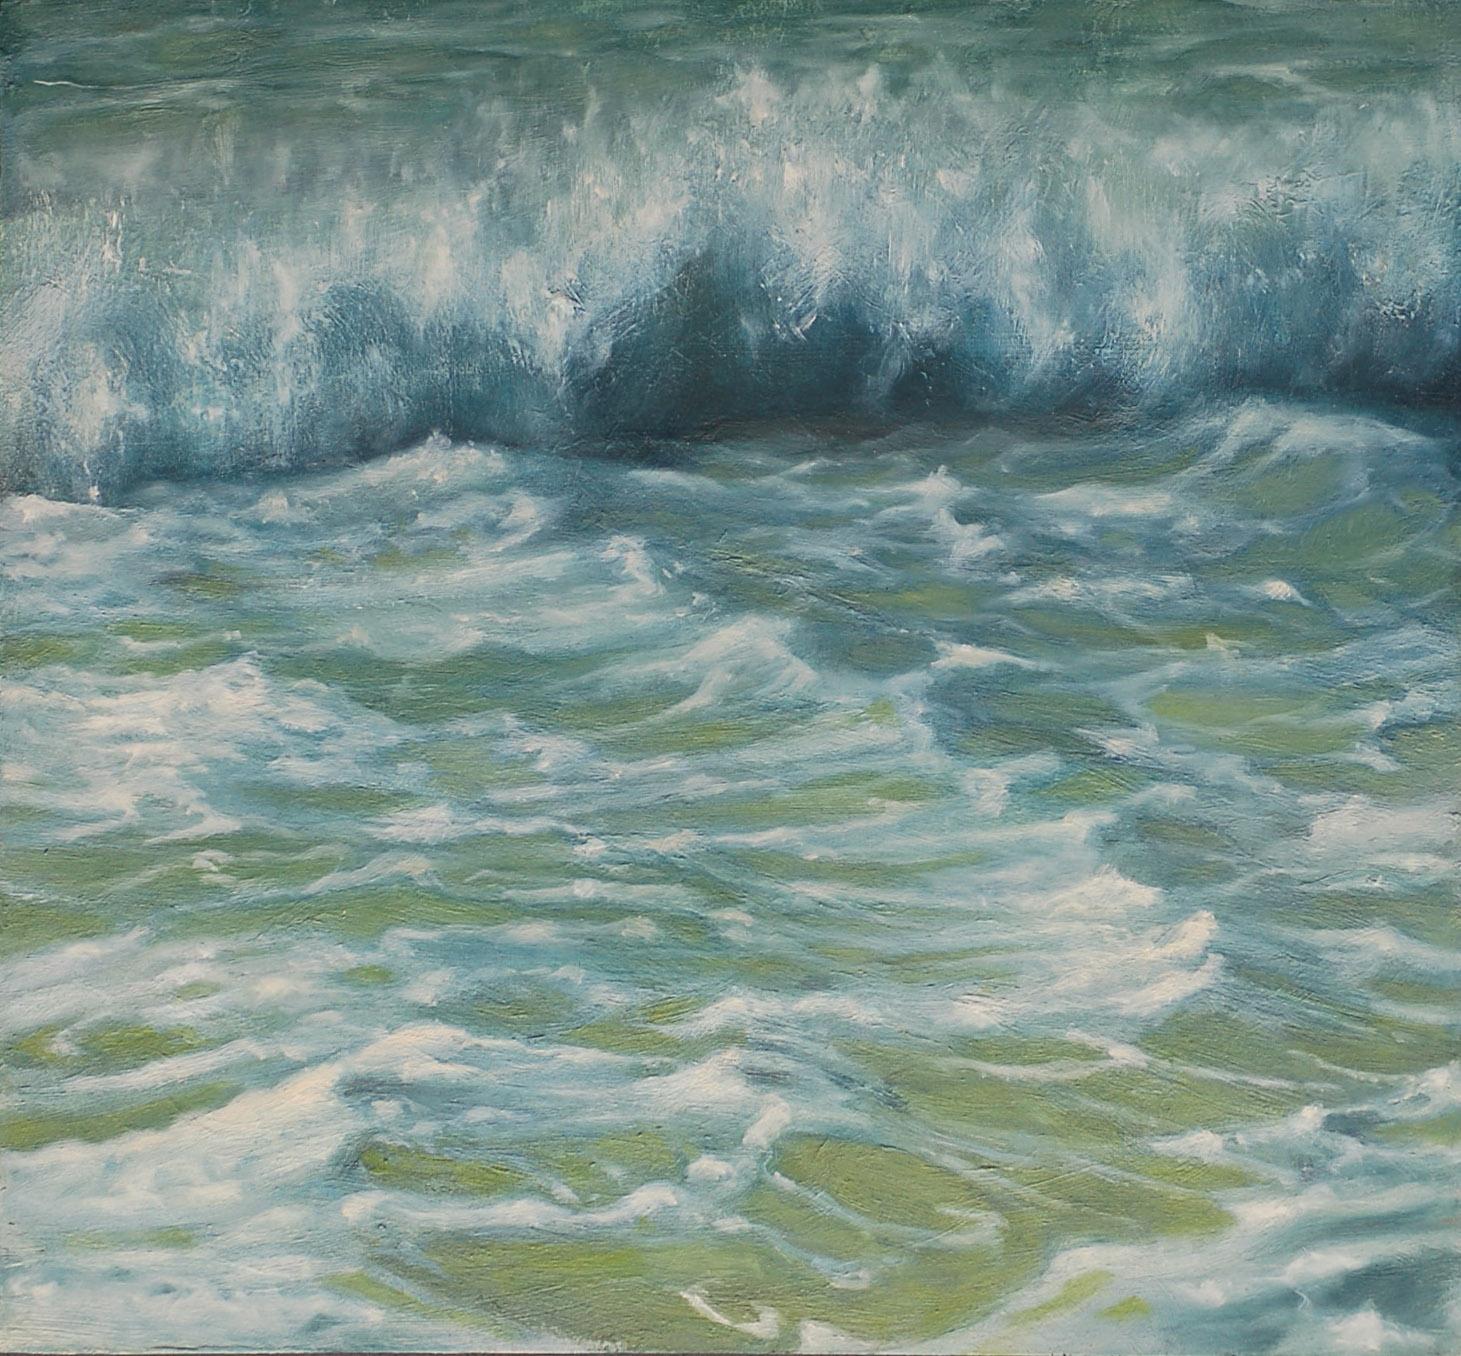 Racing Wave and Sea Foam